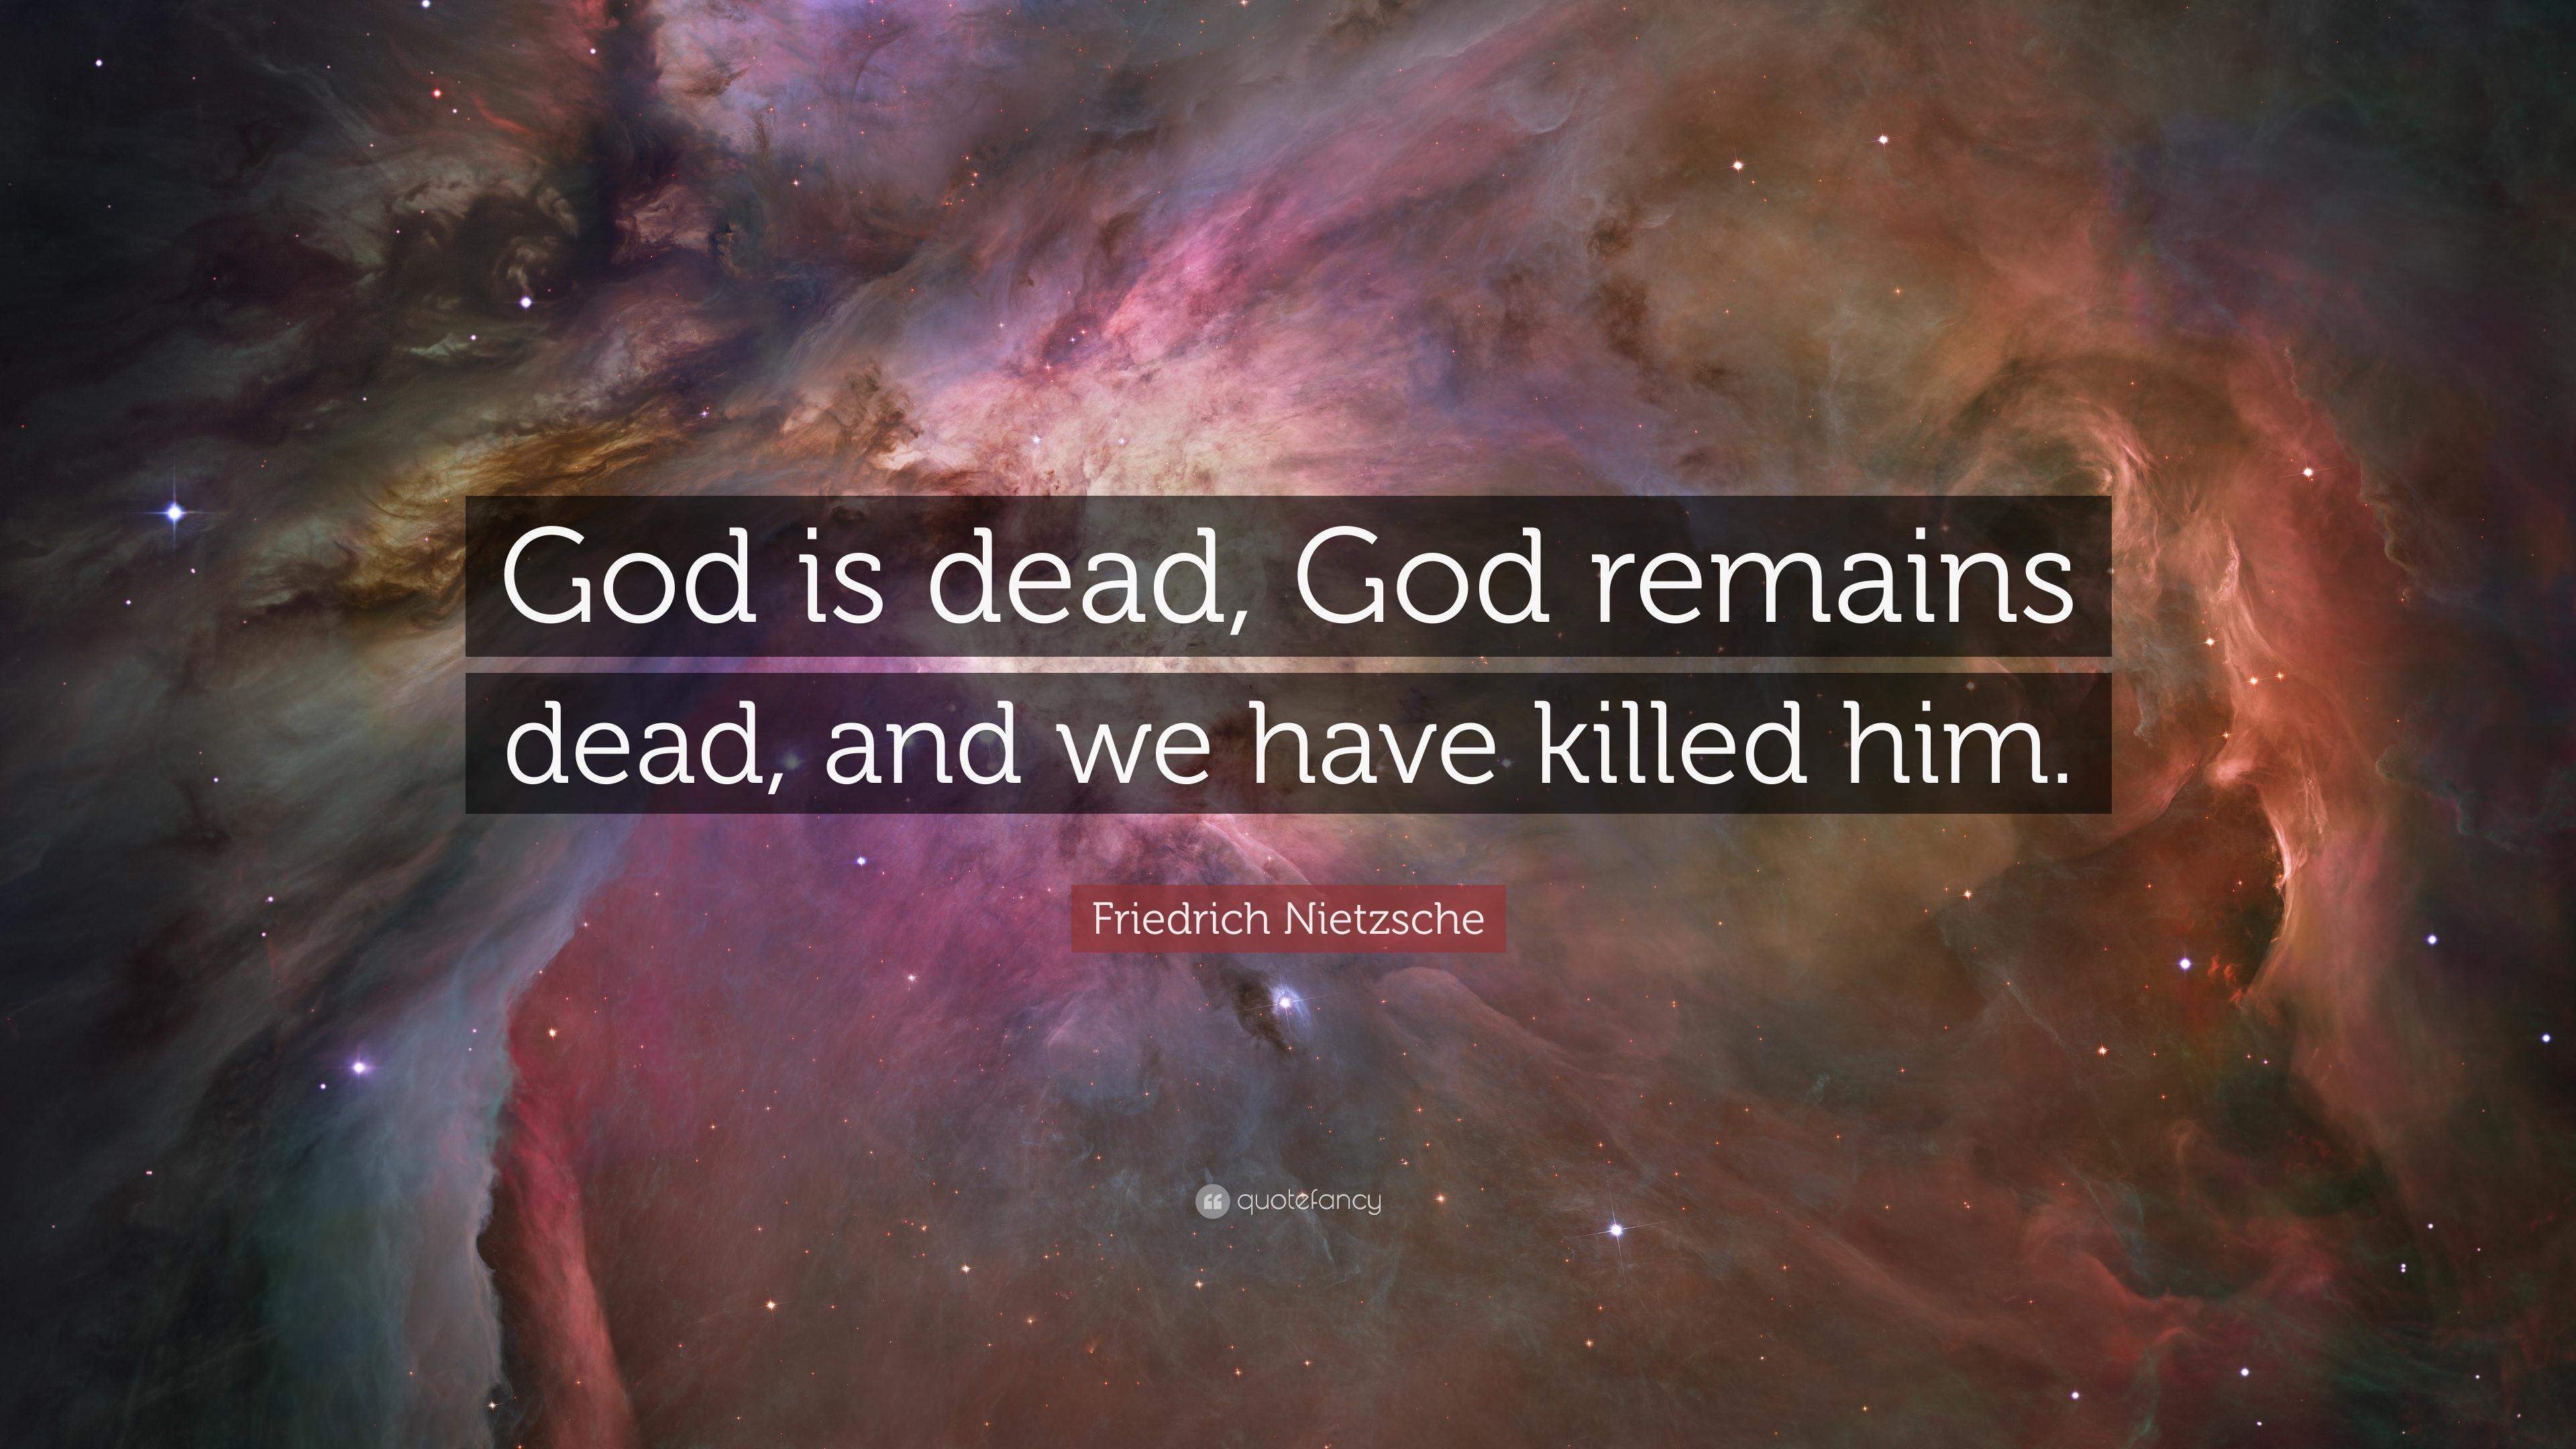 Love Wallpaper Quotes For Him Friedrich Nietzsche Quote God Is Dead God Remains Dead